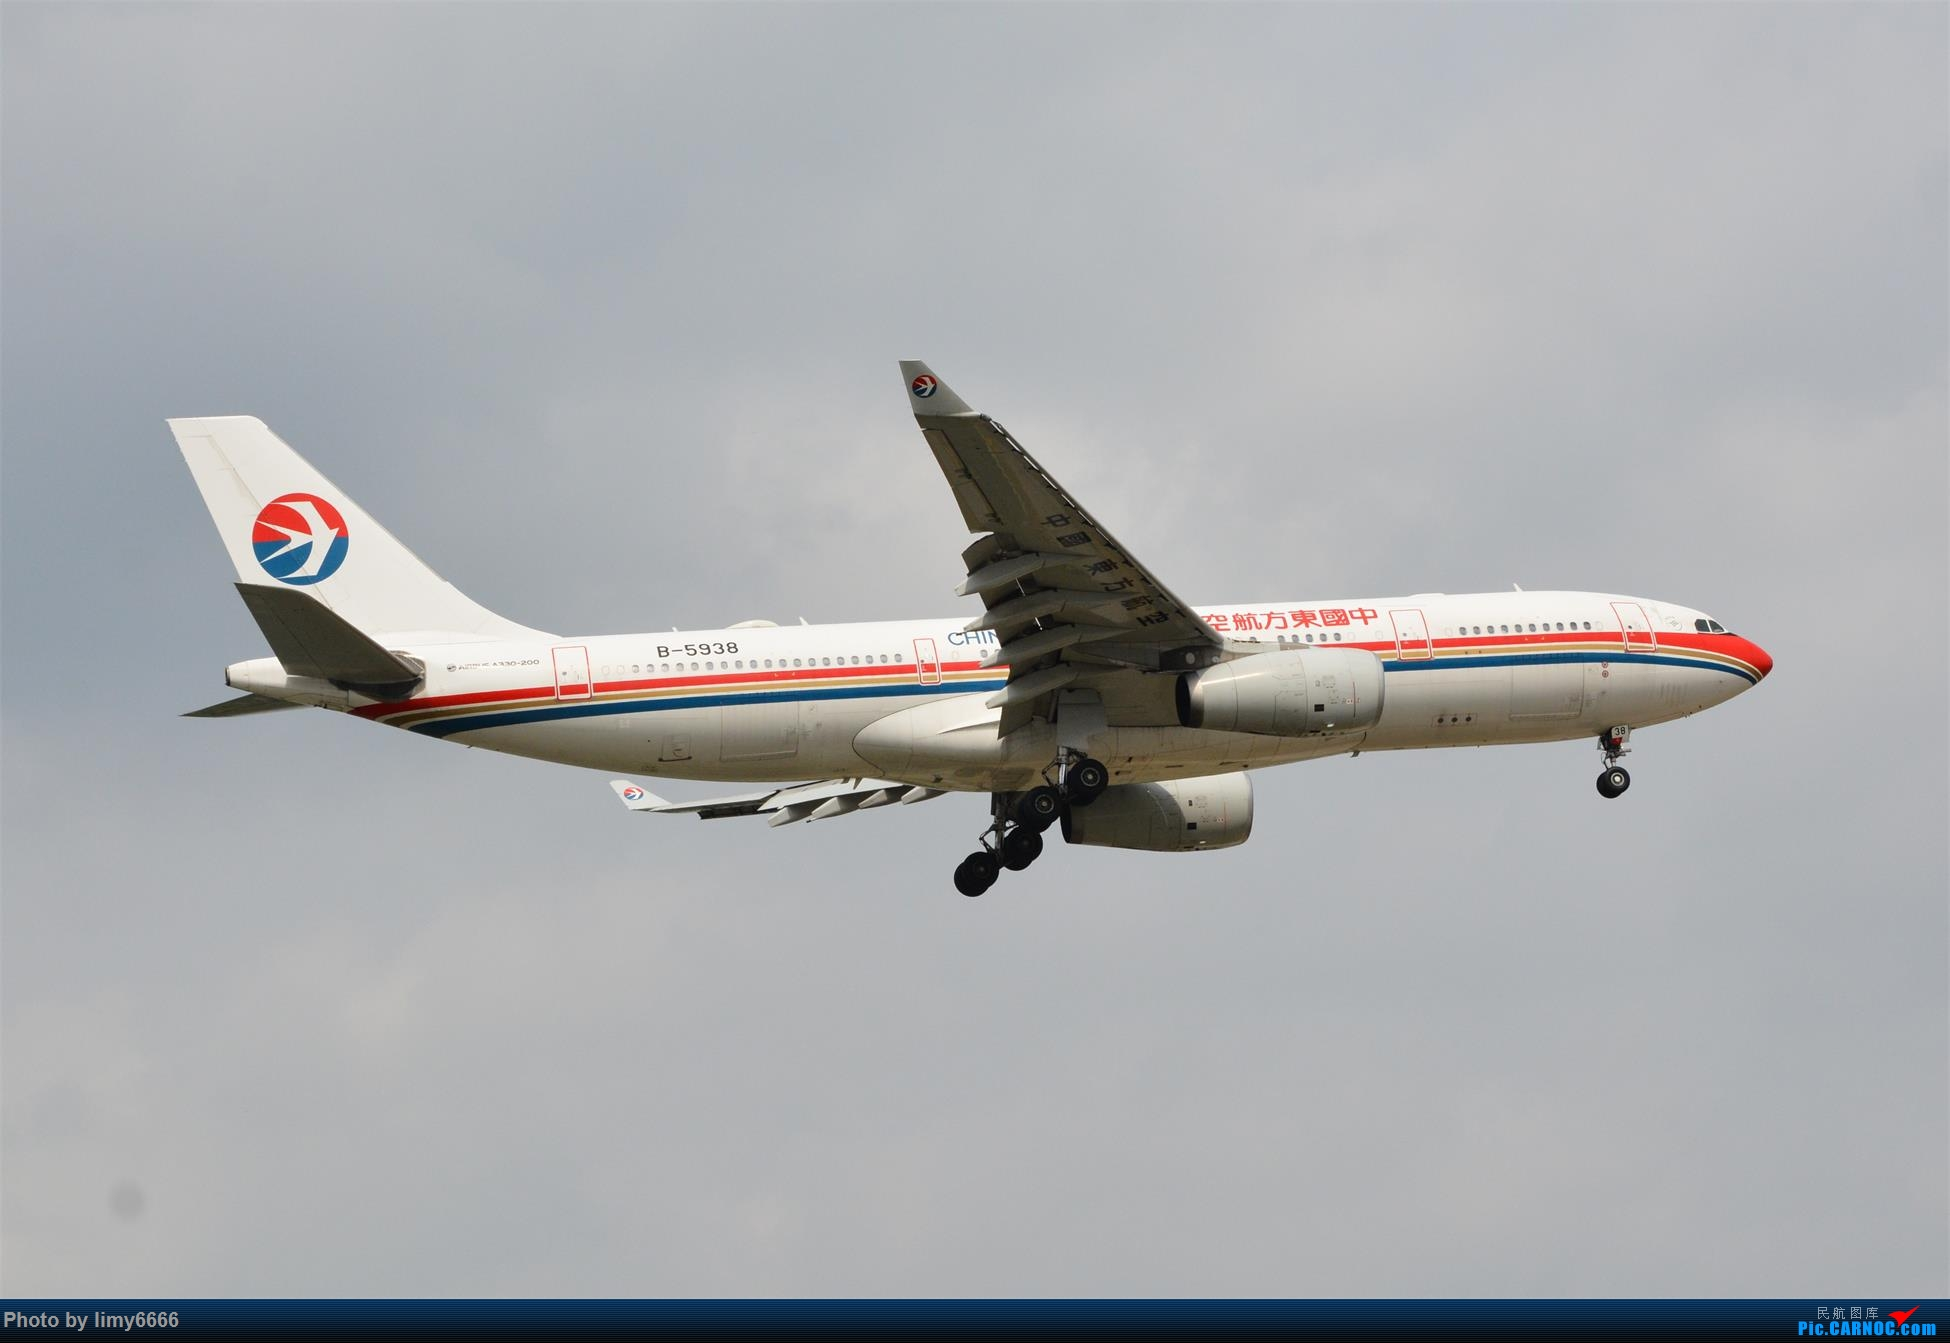 Re:[原创]上海虹桥机场拍机(在贵阳很少见或看不见的) AIRBUS A330-200 B-5938 中国上海虹桥国际机场